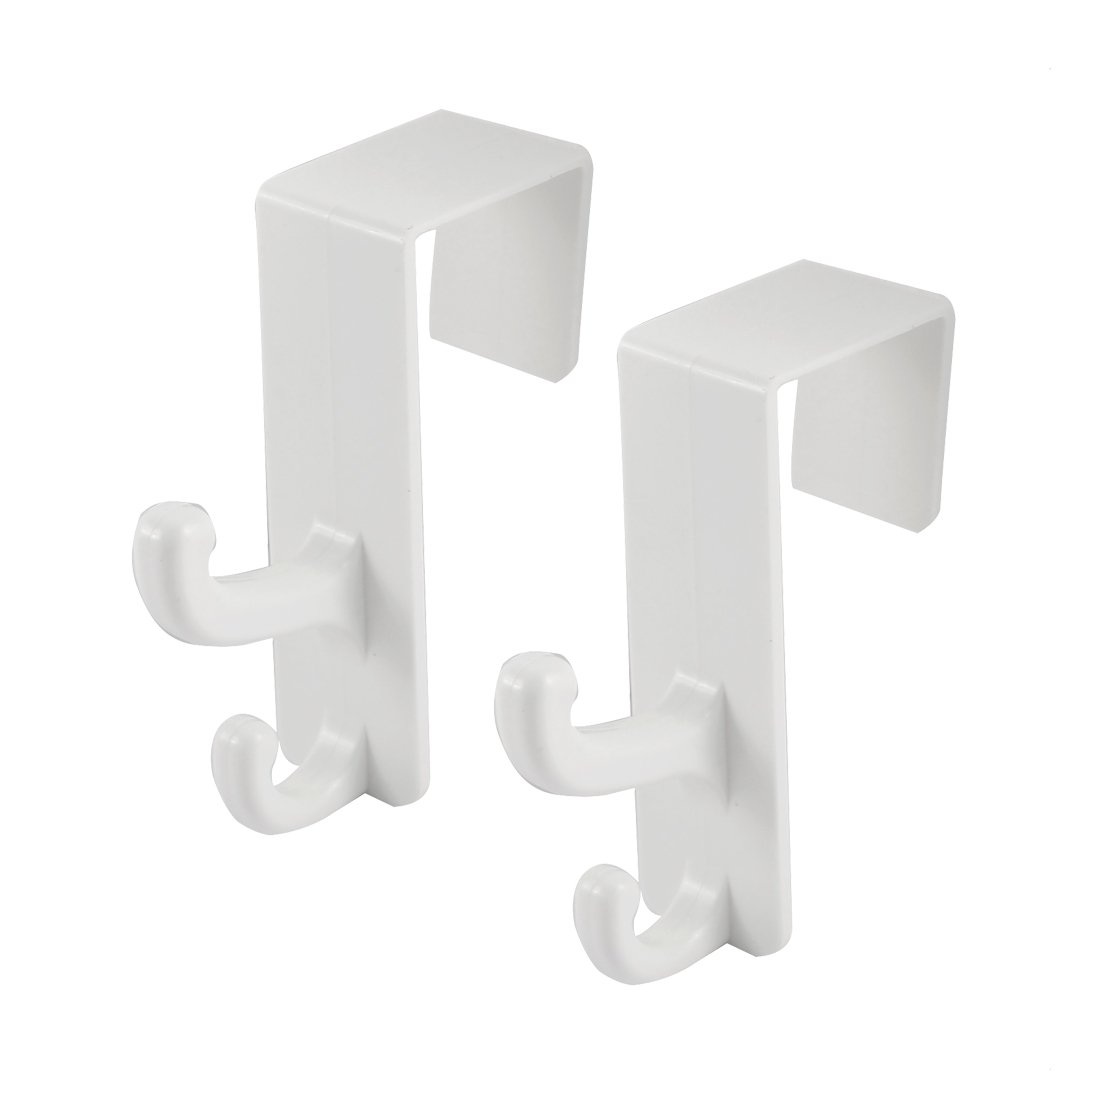 uxcell Plastic Family Bathroom Towel Bathrobe Over Door Hooks Hanger 2 PCS hot sale 2017